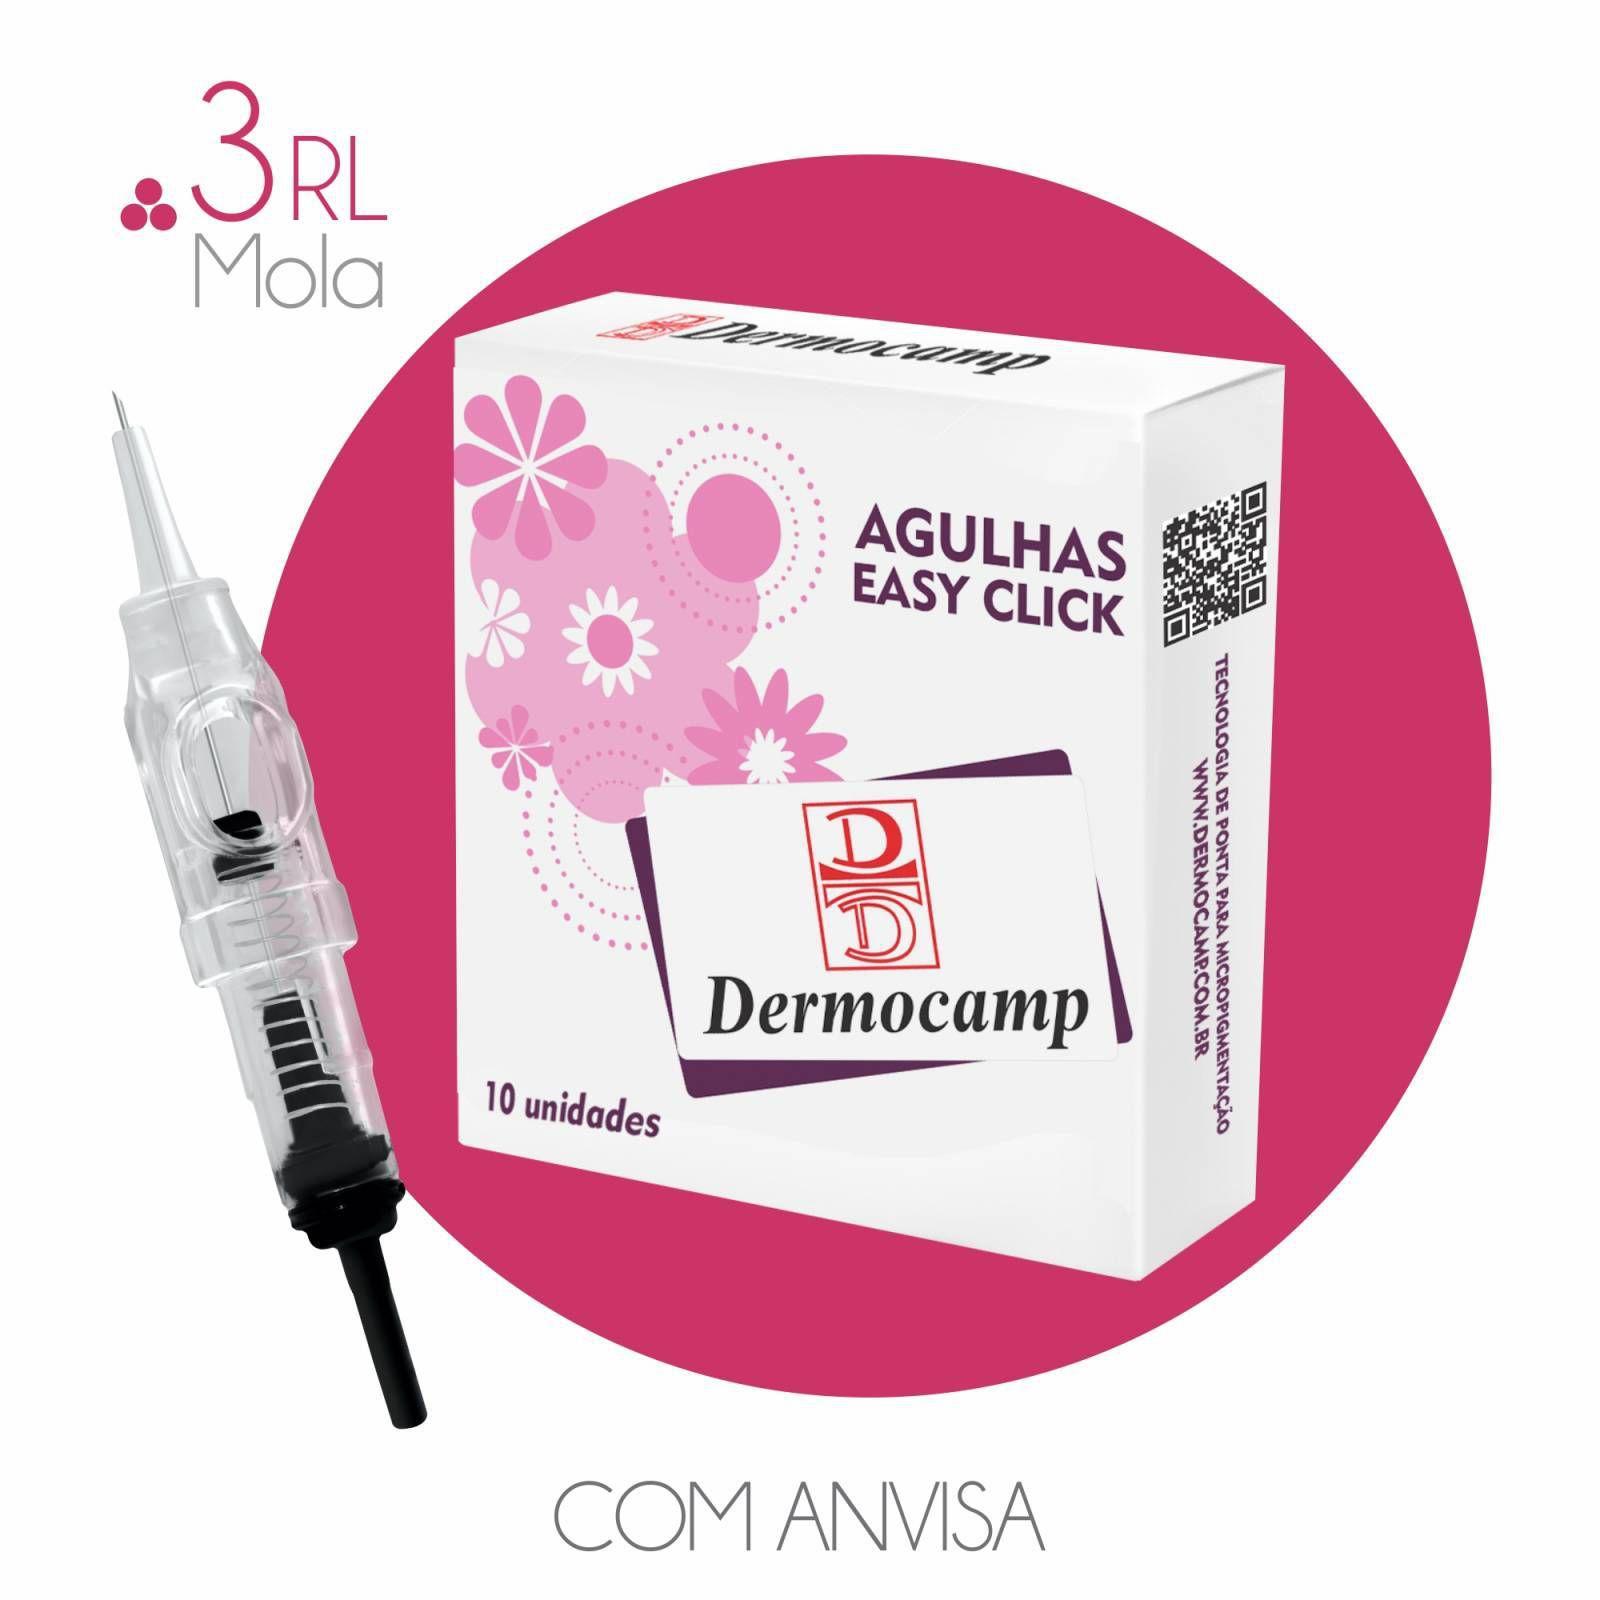 AGULHA EASY CLICK DERMOCAMP DE 3 PONTAS CIRCULAR - MOLA  (REGISTRADA NA ANVISA)  - Misstética